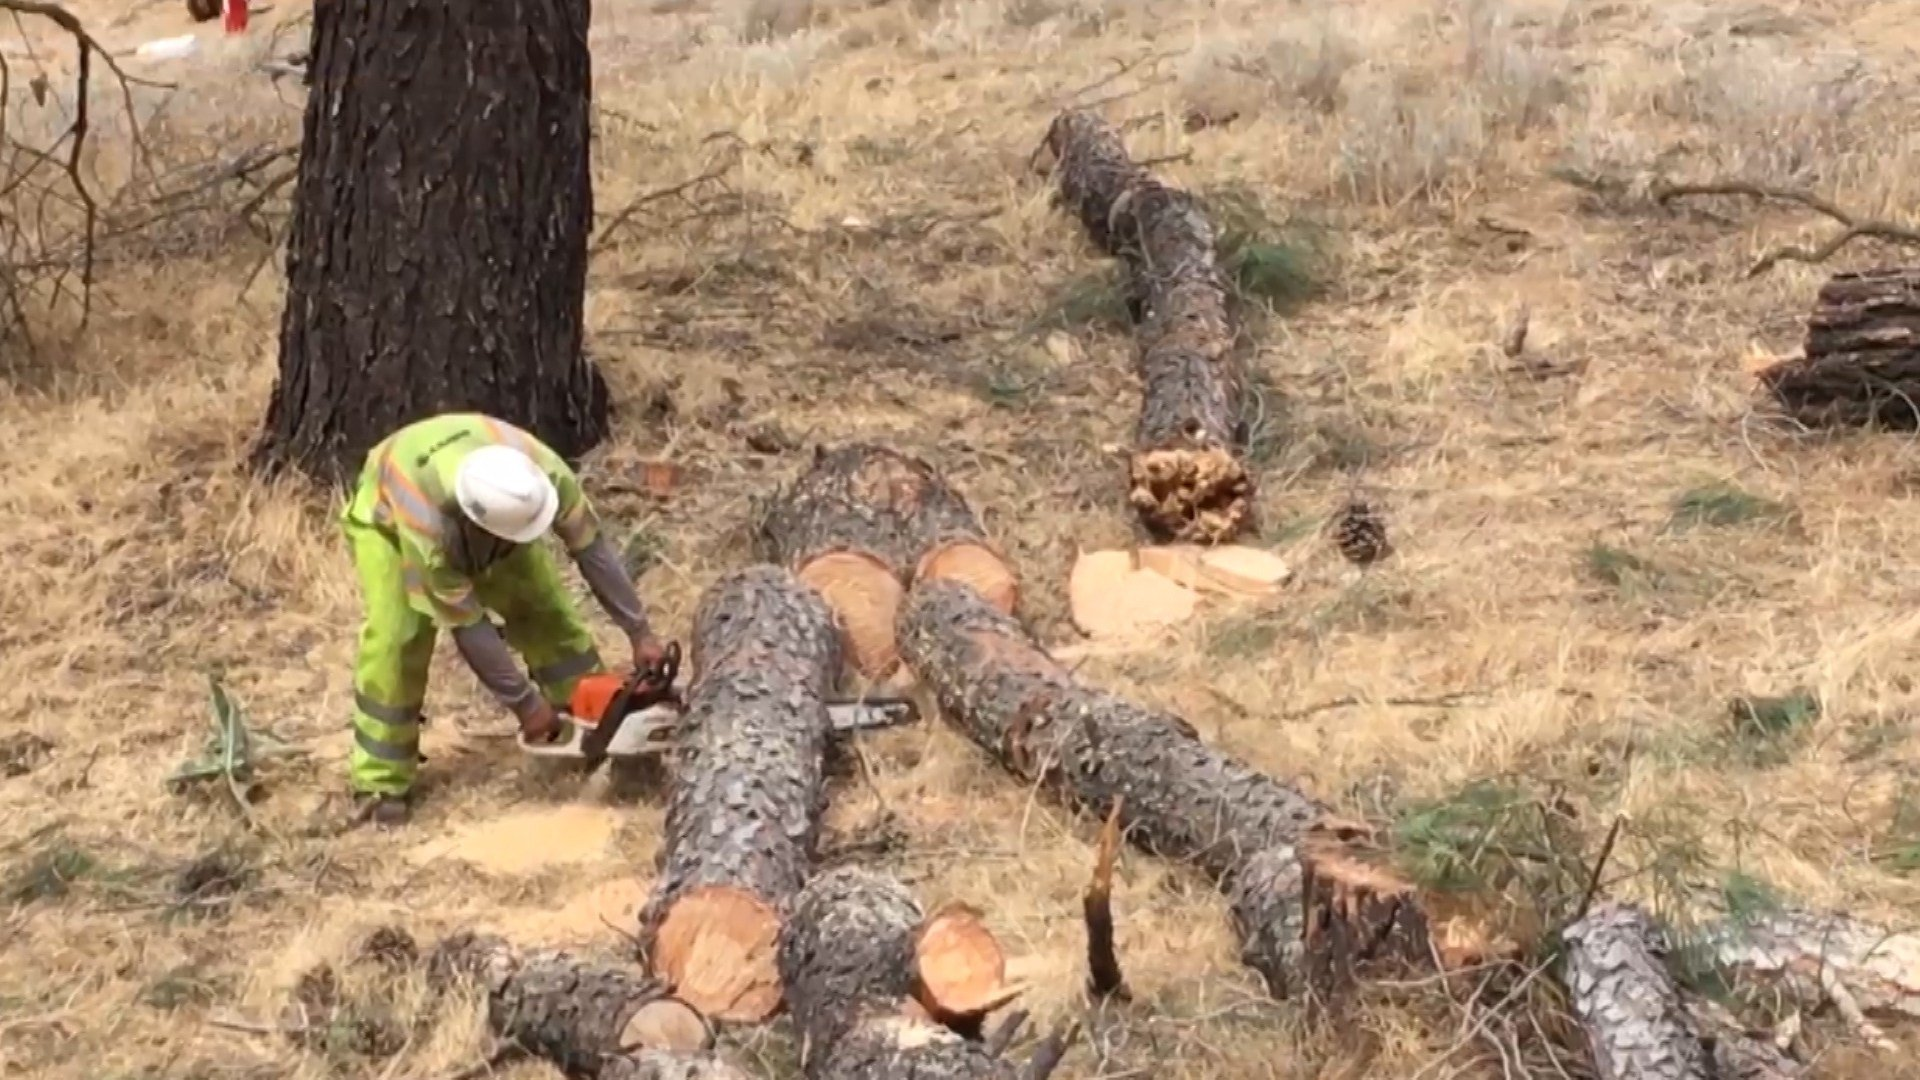 Crews remove potentially hazardous trees near power lines. (Photo courtesy PG&E)